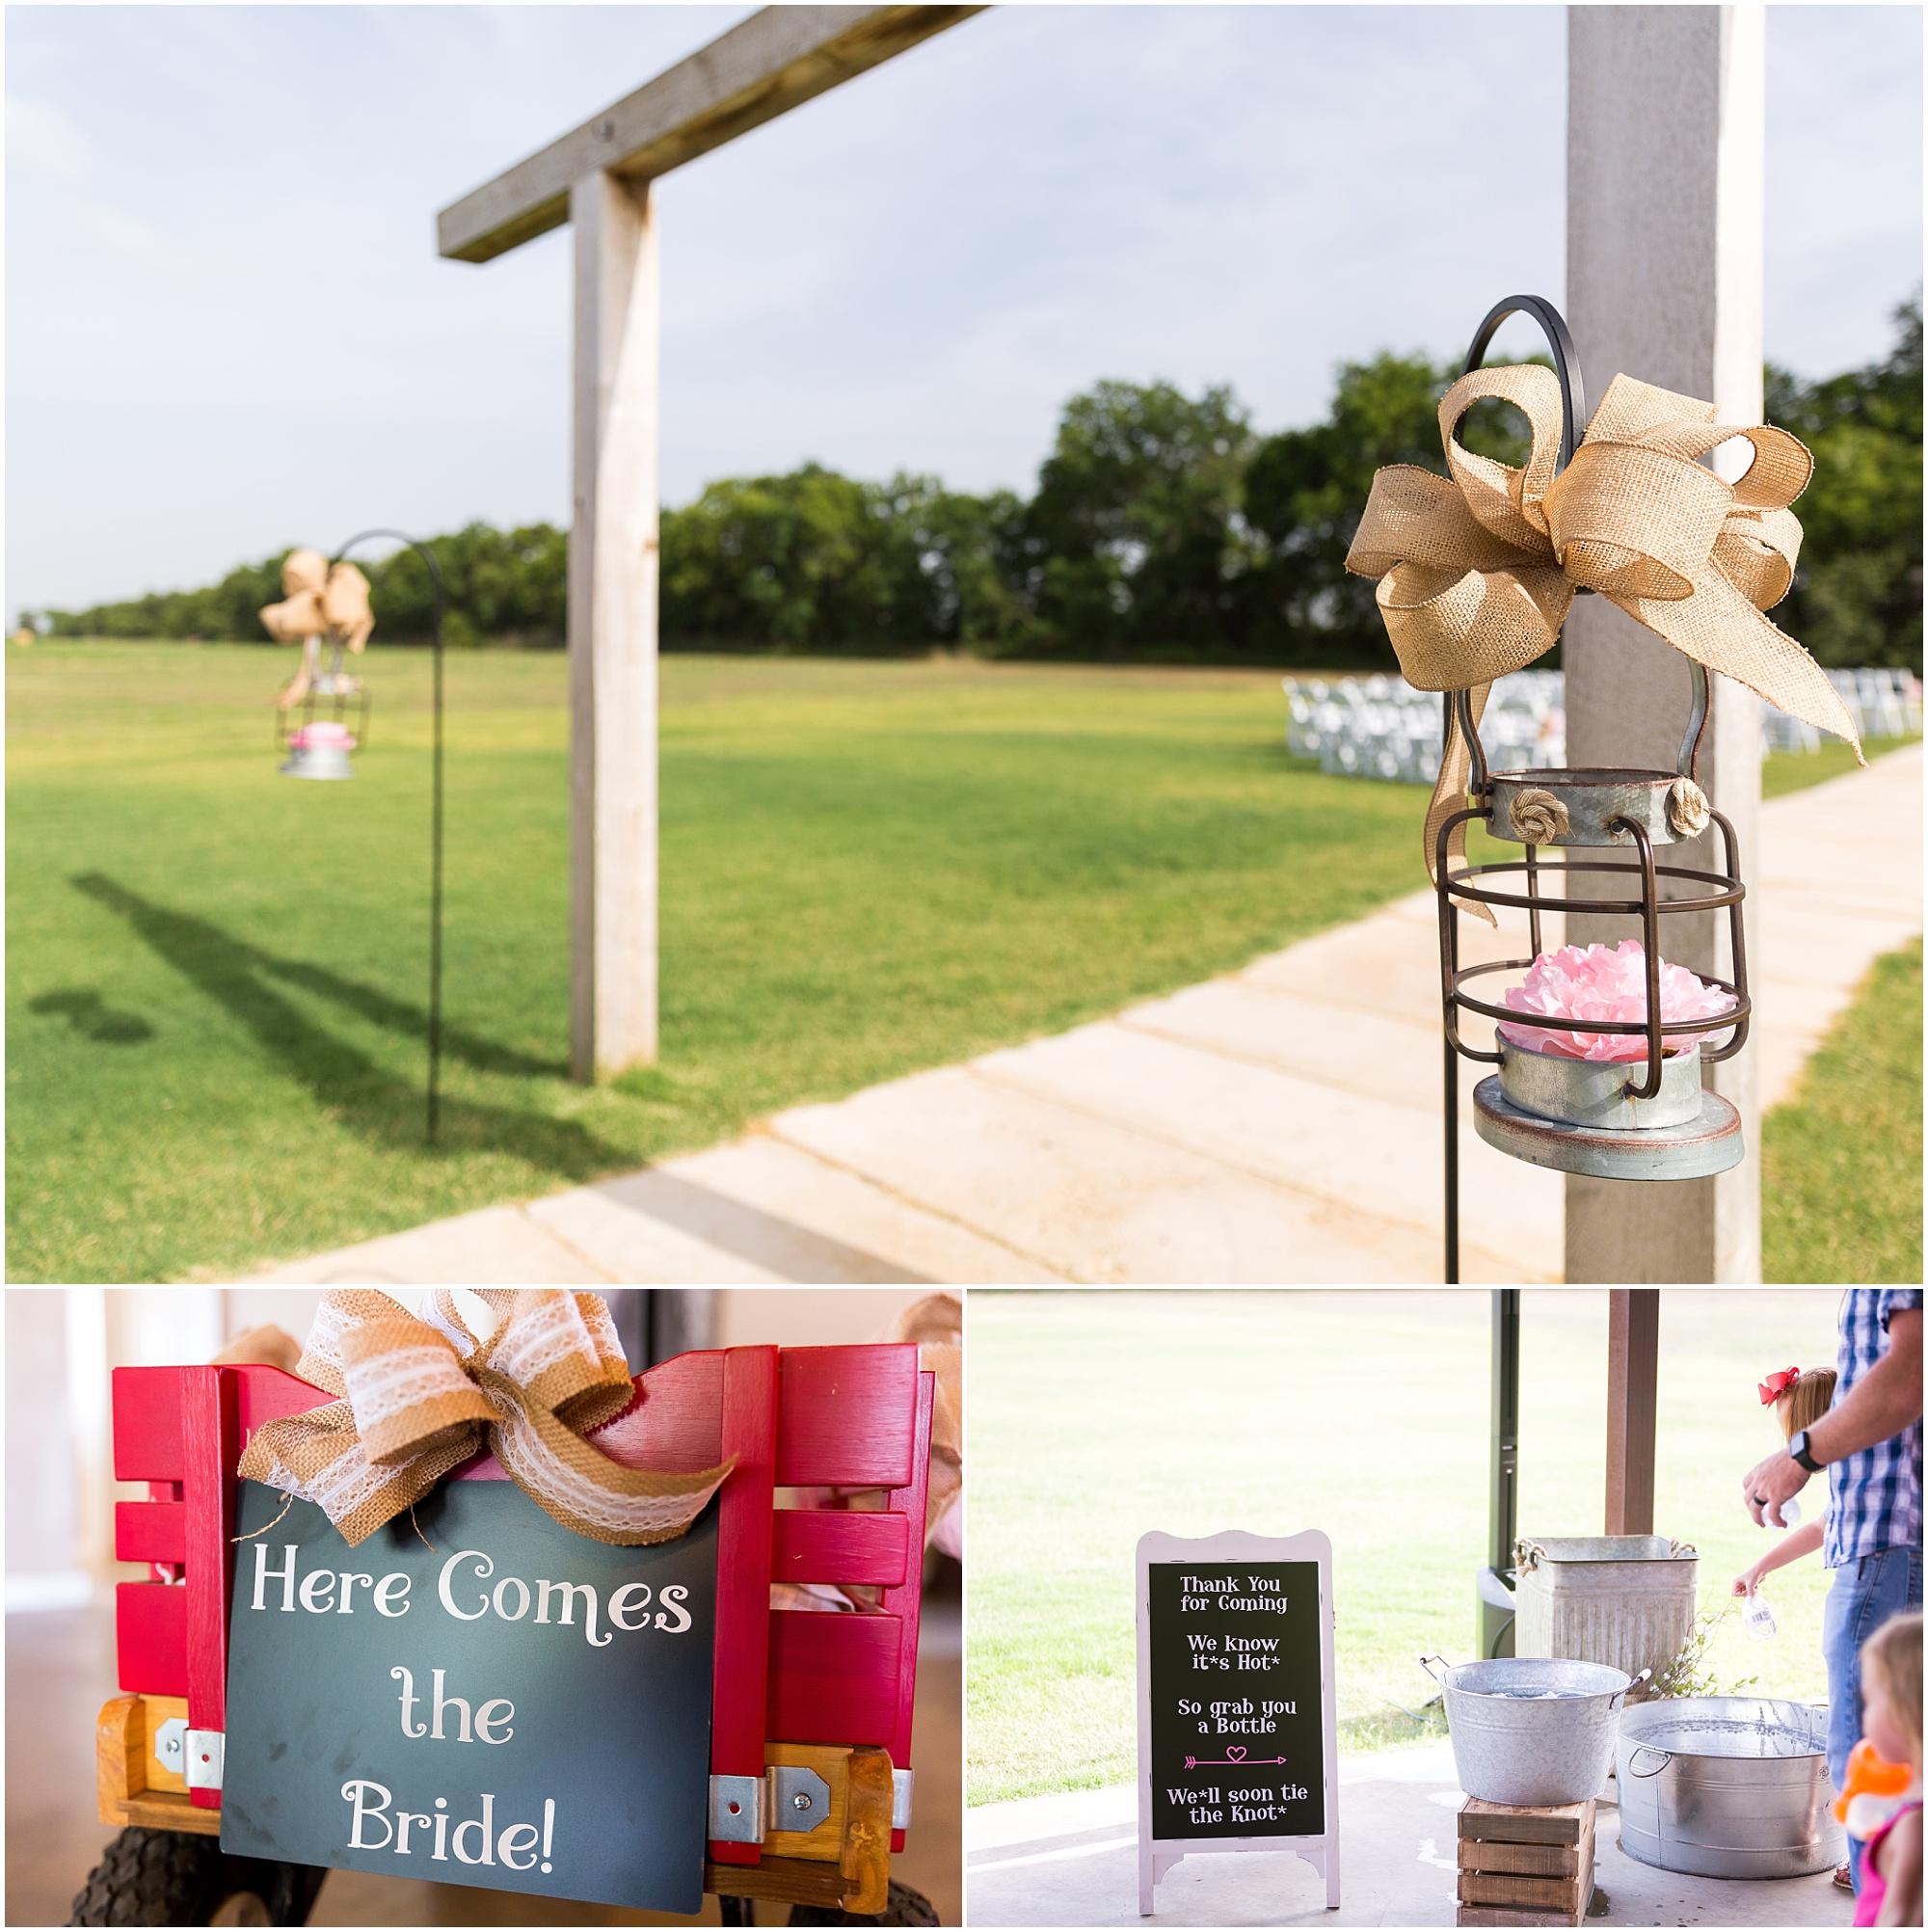 Details for a summer outdoor rustic wedding - Jason & Melaina Photography - www.jasonandmelaina.com